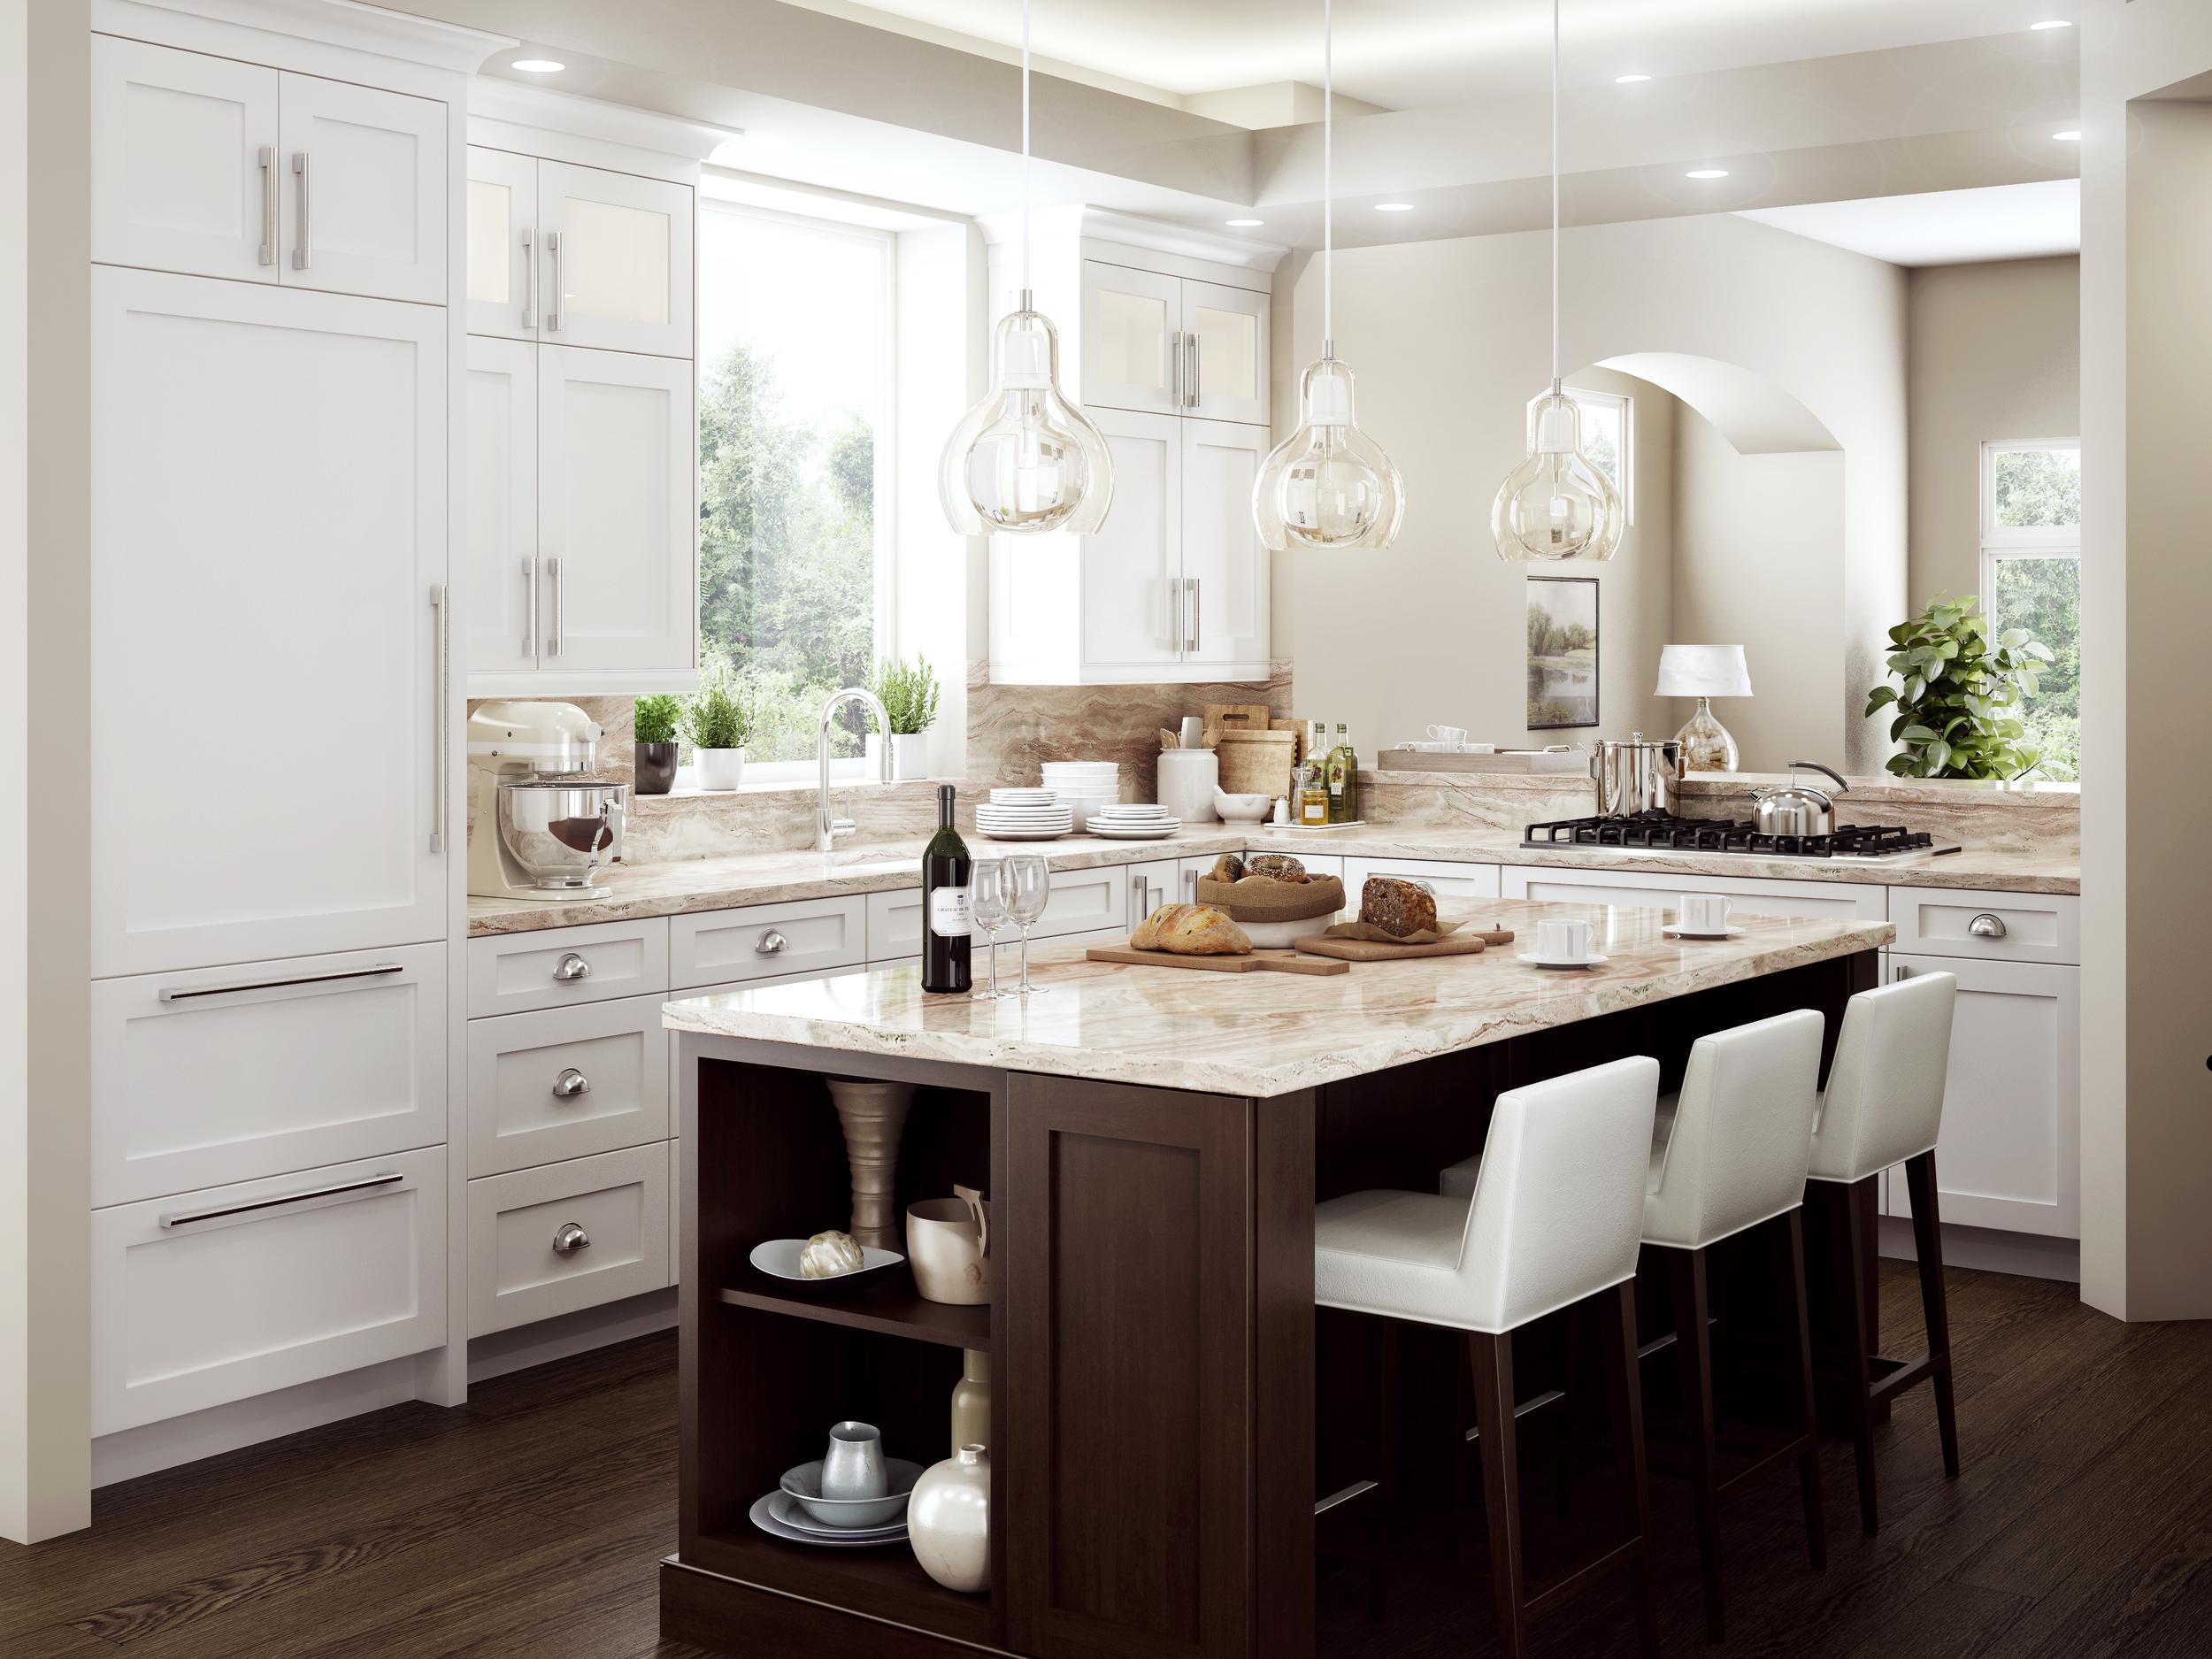 Wynnbrooke White Kitchen_large.jpg